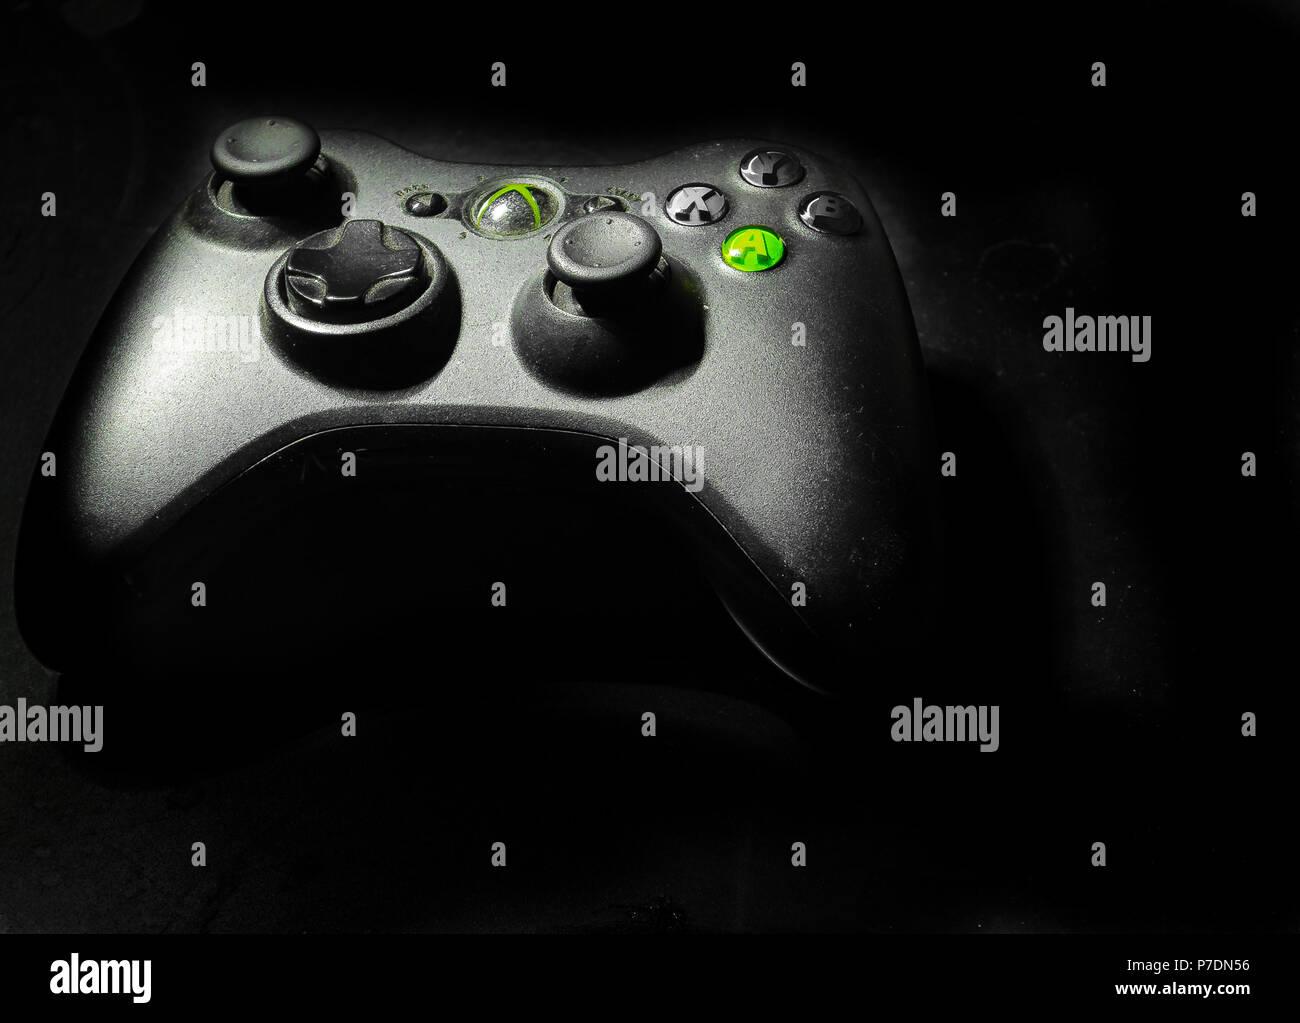 Xbox Joystick - Stock Image